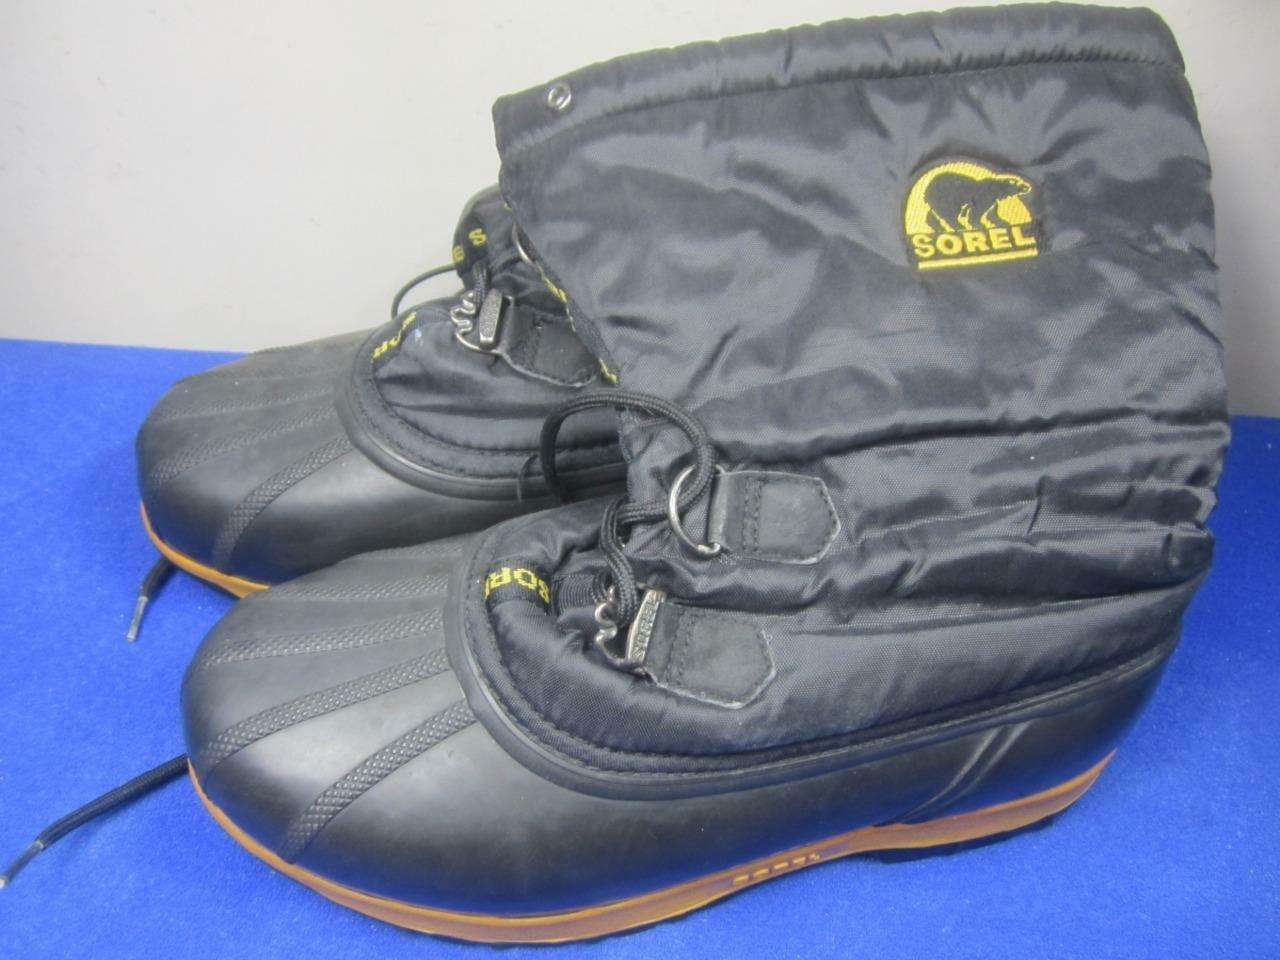 Nice Pair Sorel Boots Size 7 Excellent Condition